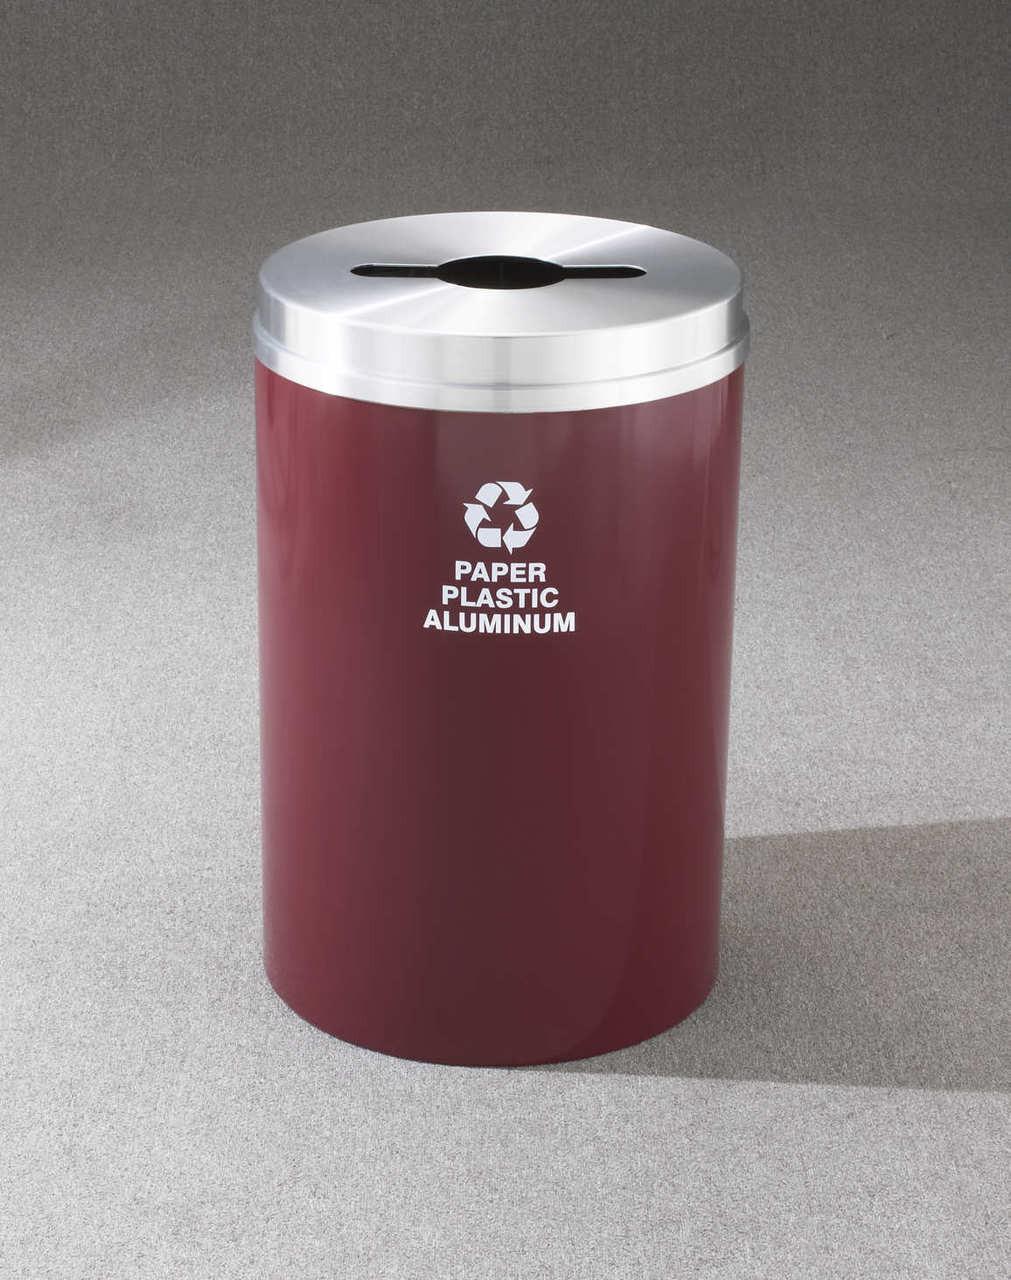 Glaro Metal Recycling Trash Can Burgundy 33 Gallon